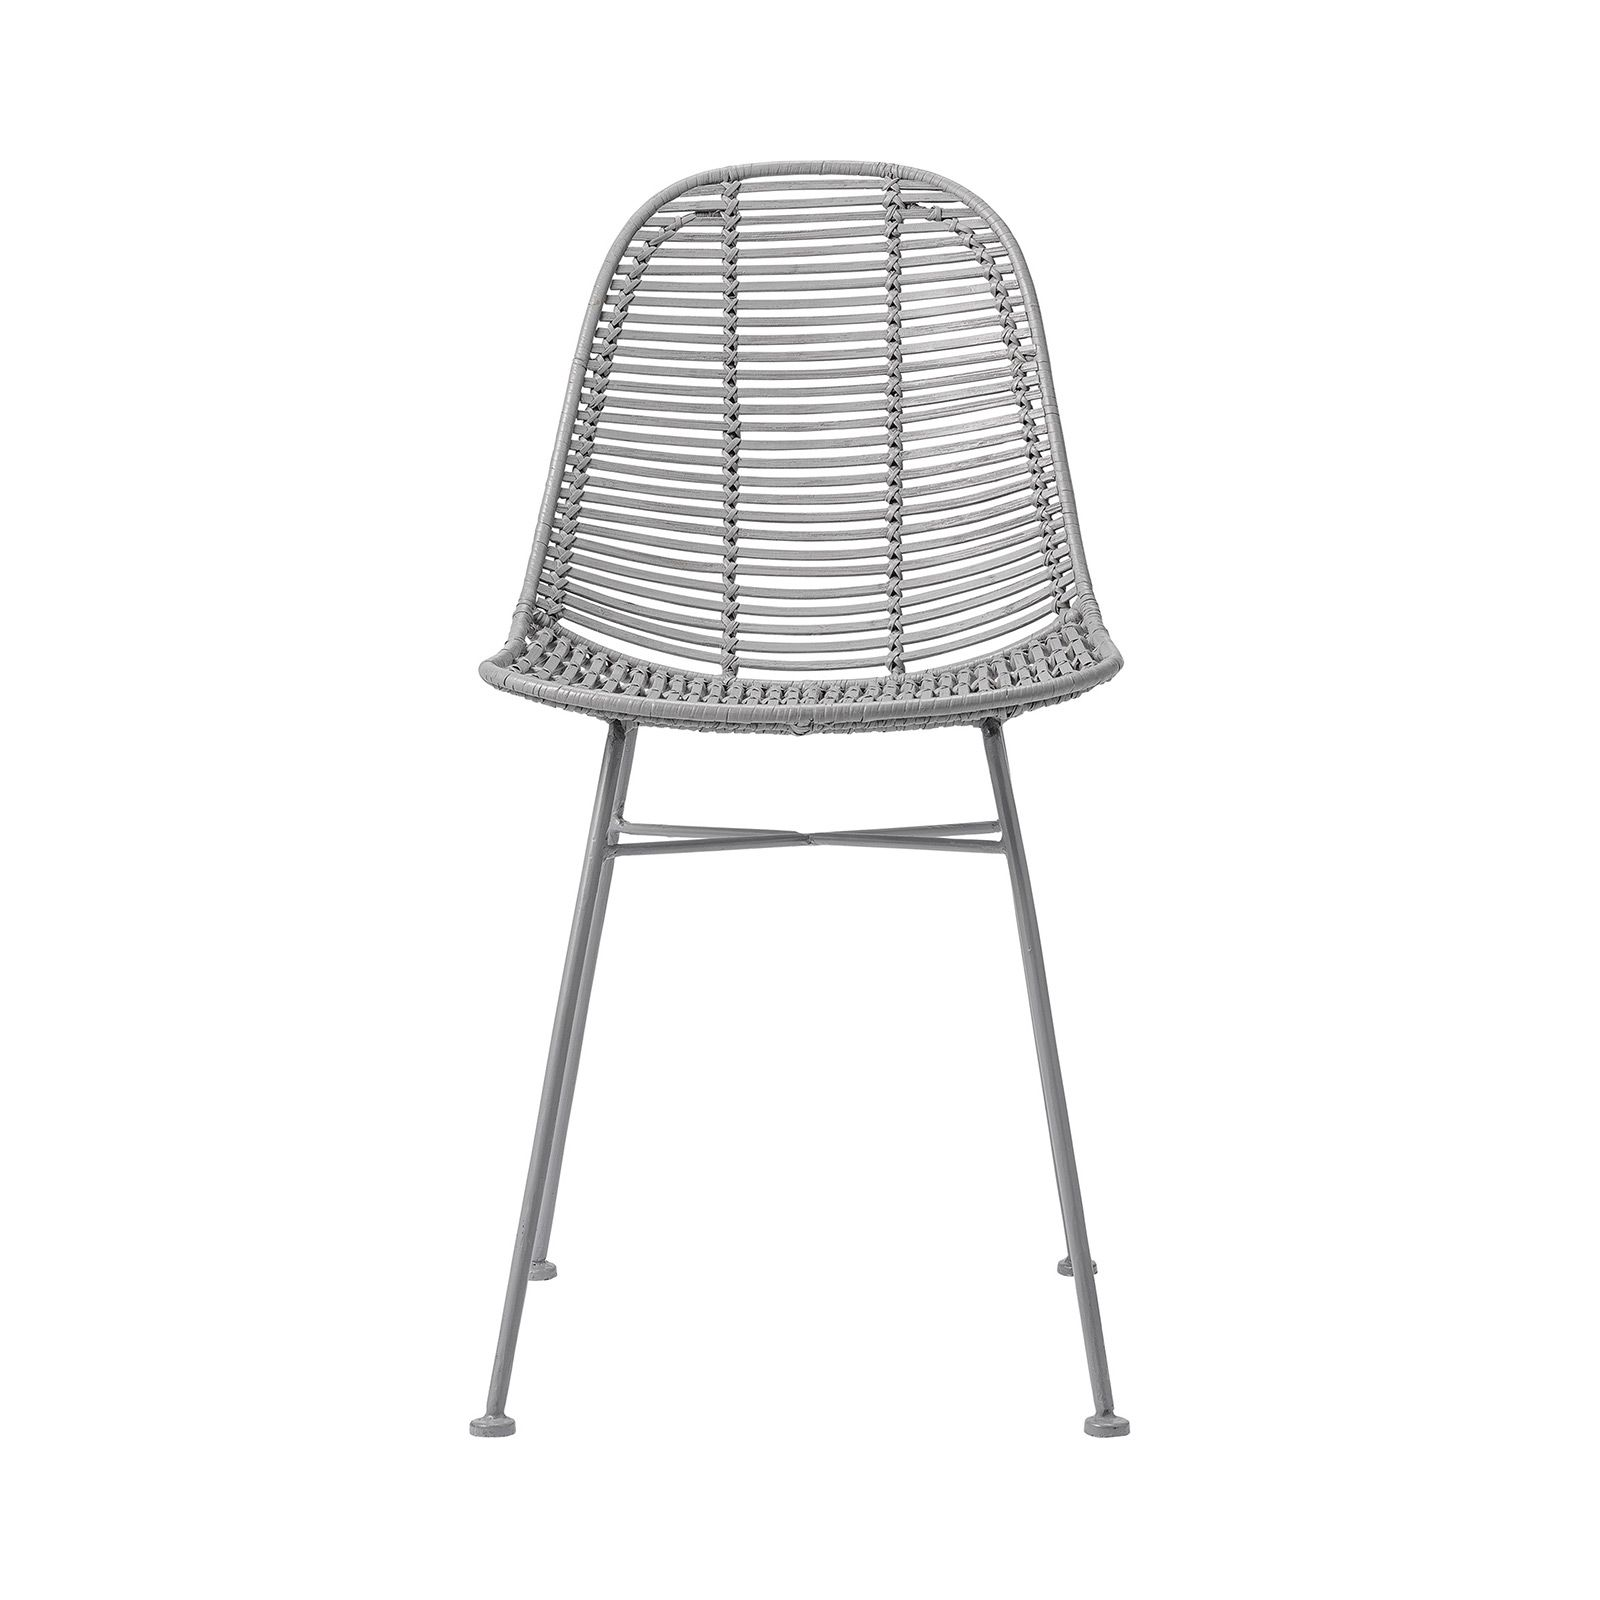 Sarasota Rattan Chair Dot & Bo diy